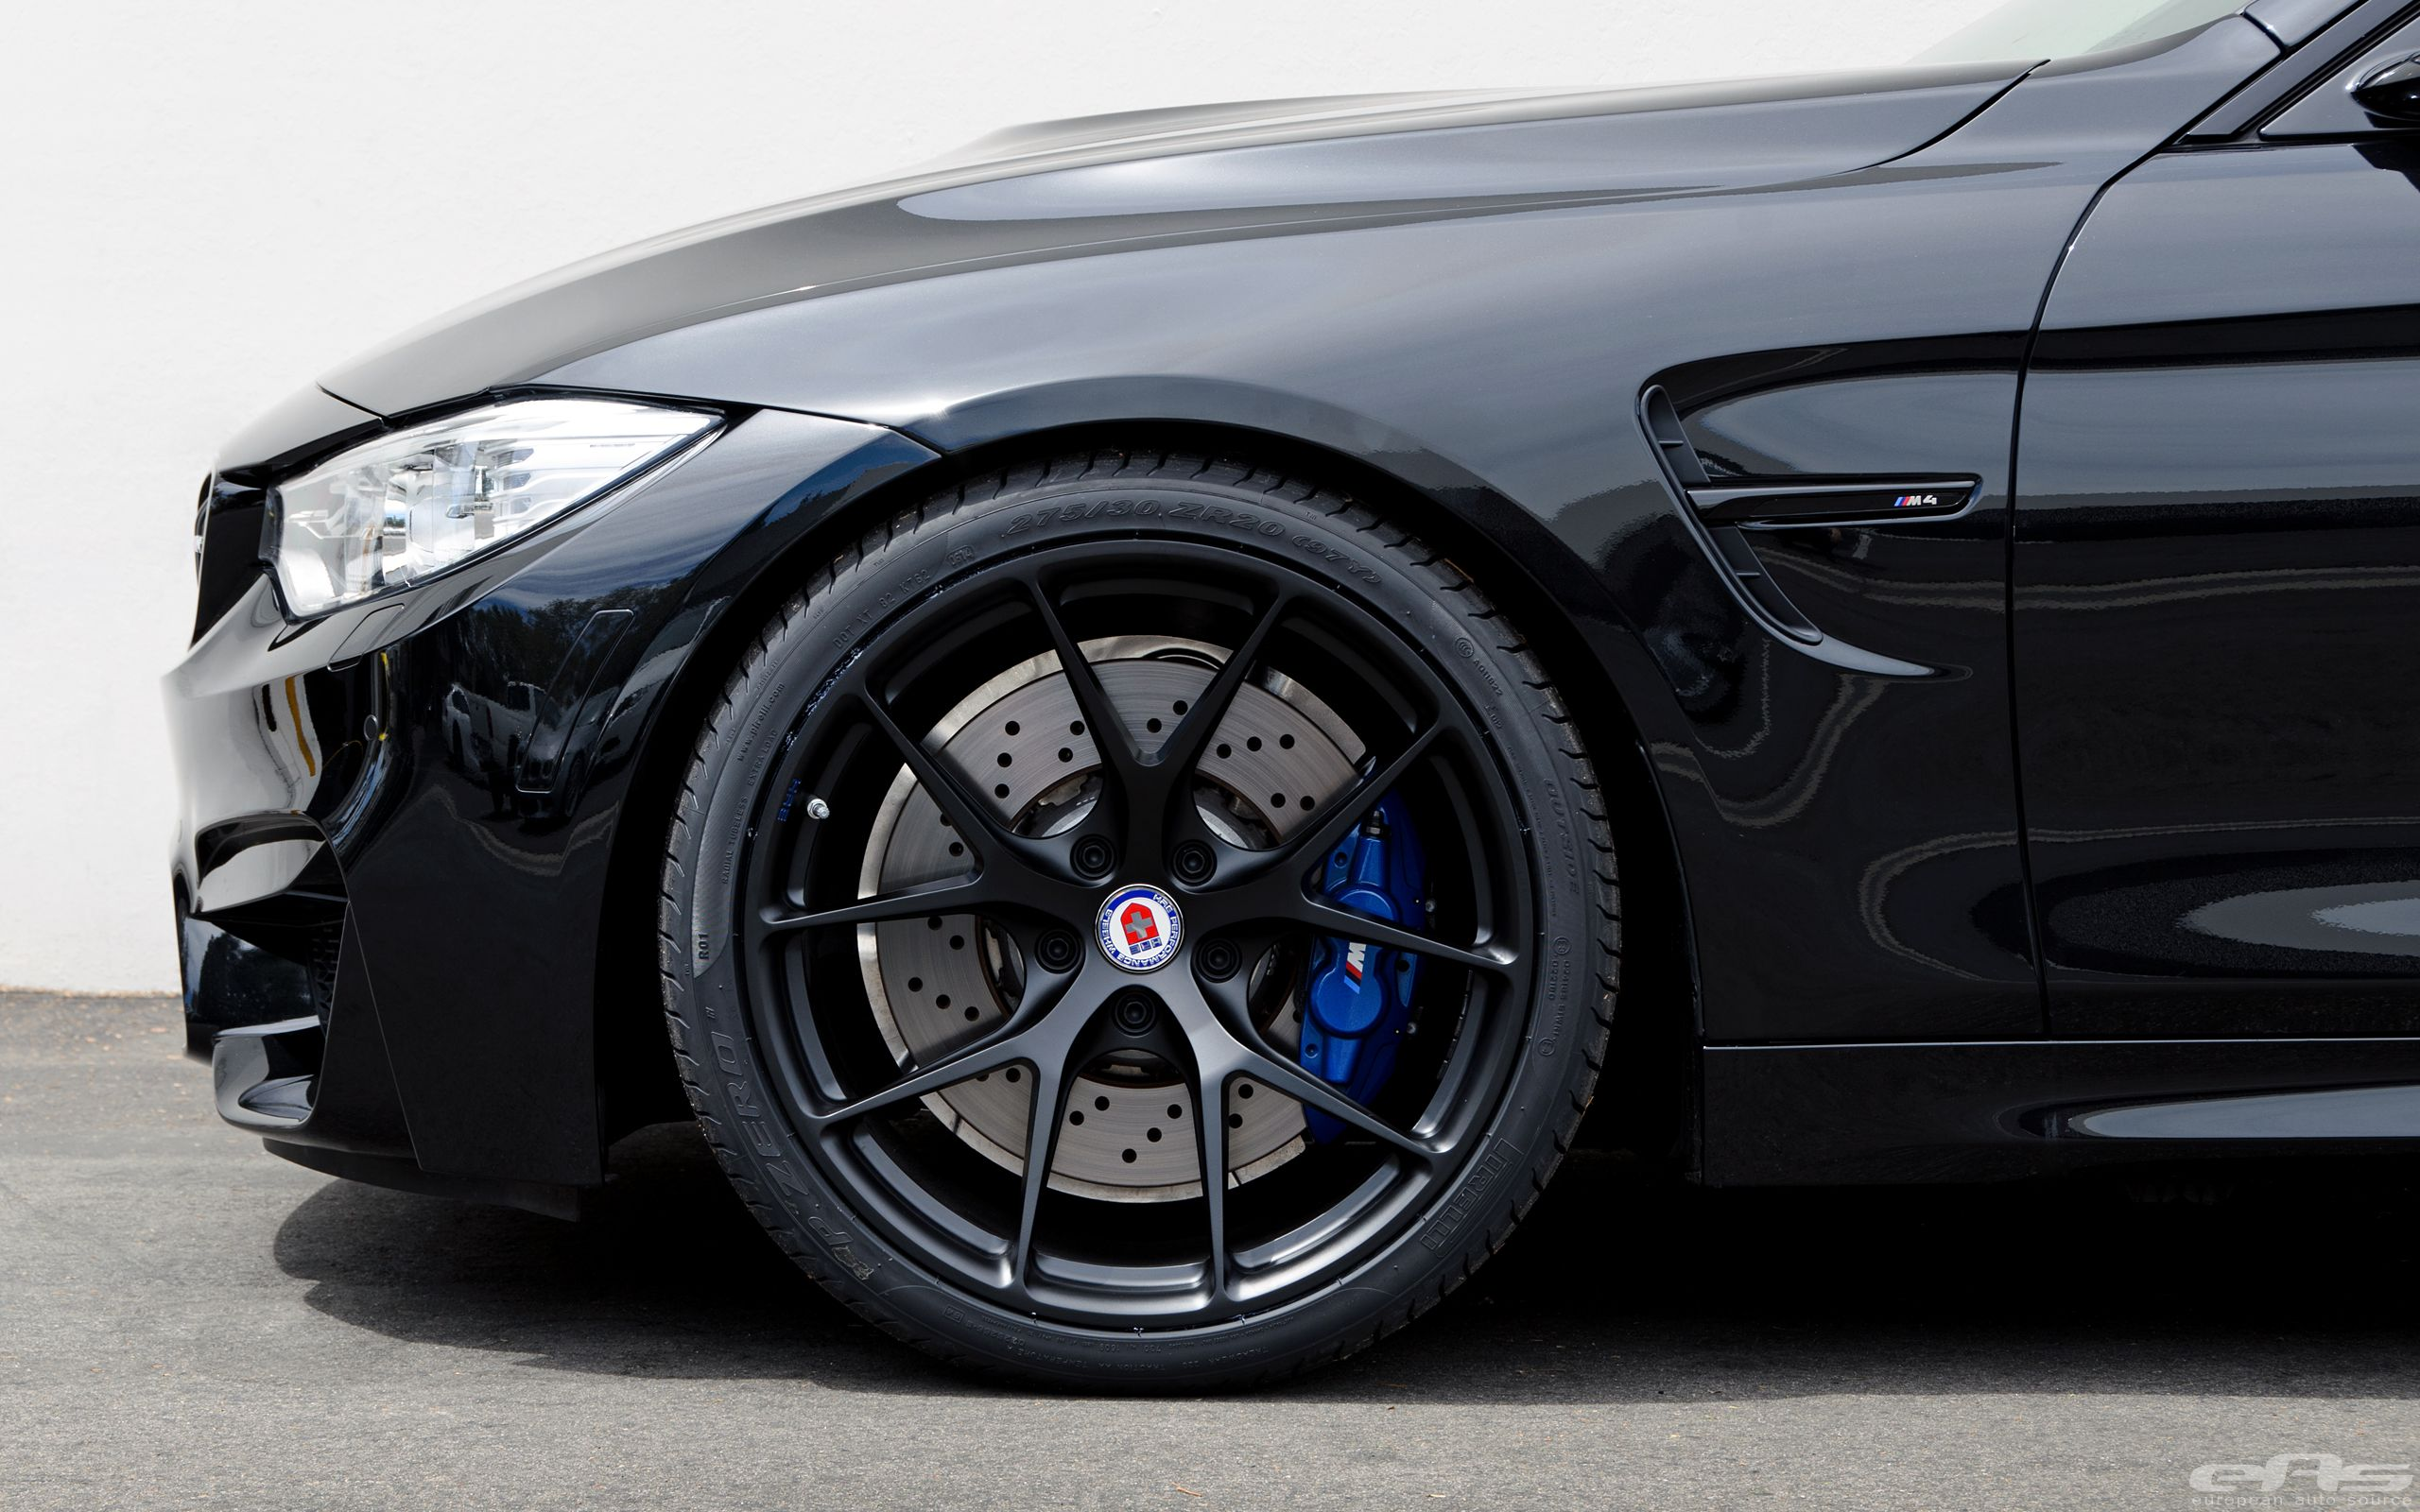 Black Sapphire Bmw M4 With Matte Black Hre Wheels Bmw M4 Bmw Wheels Bmw